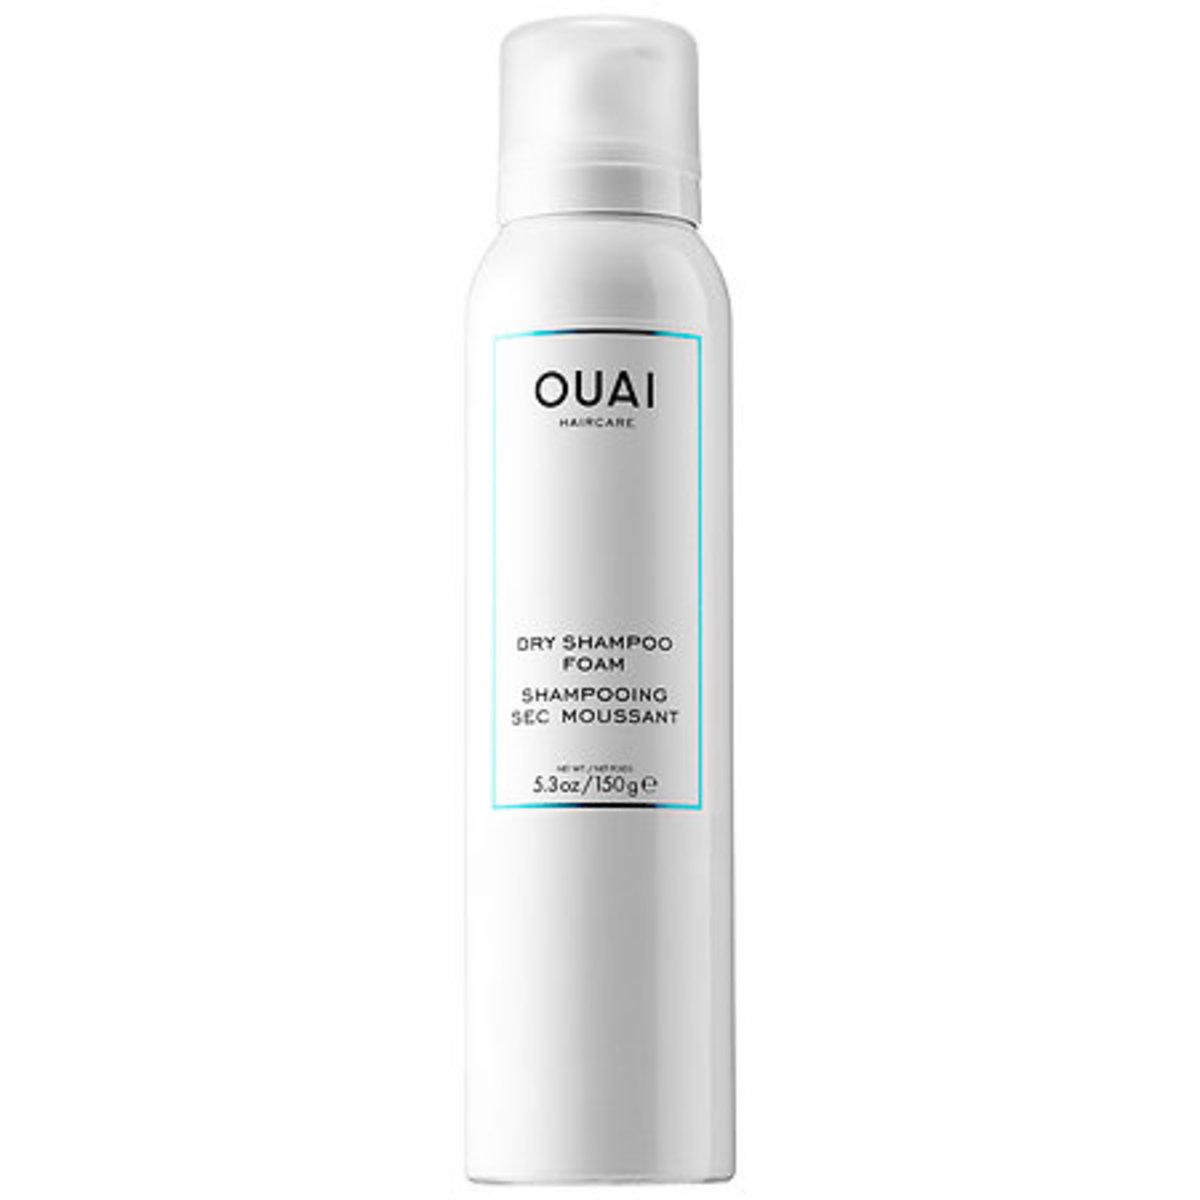 Ouai Dry Shampoo Foam, $28, available at Sephora.